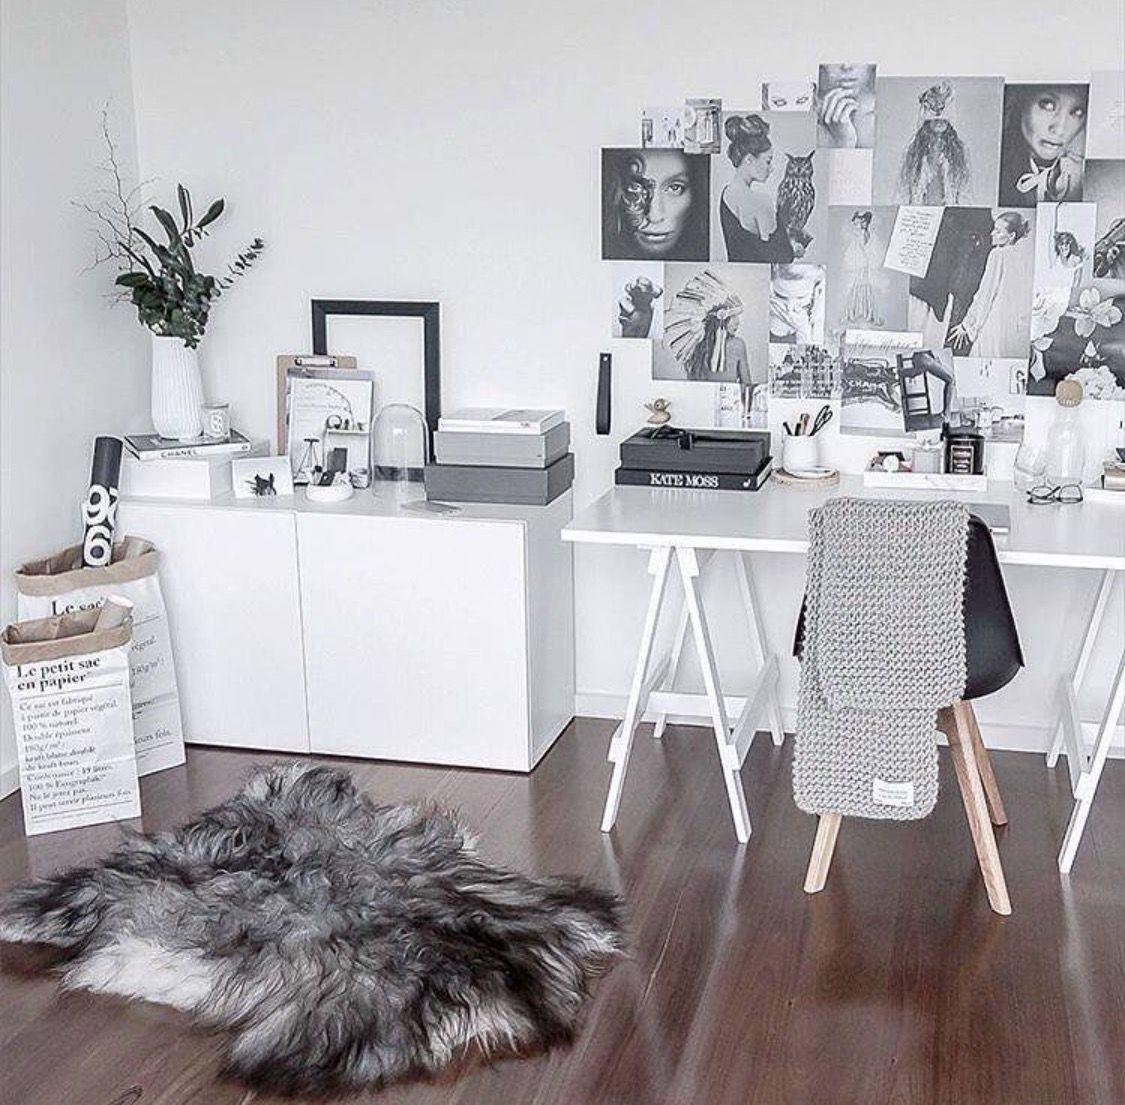 Pin de kaitlyn forte en ROOM | Pinterest | Casa de amor, Bosco y Deco